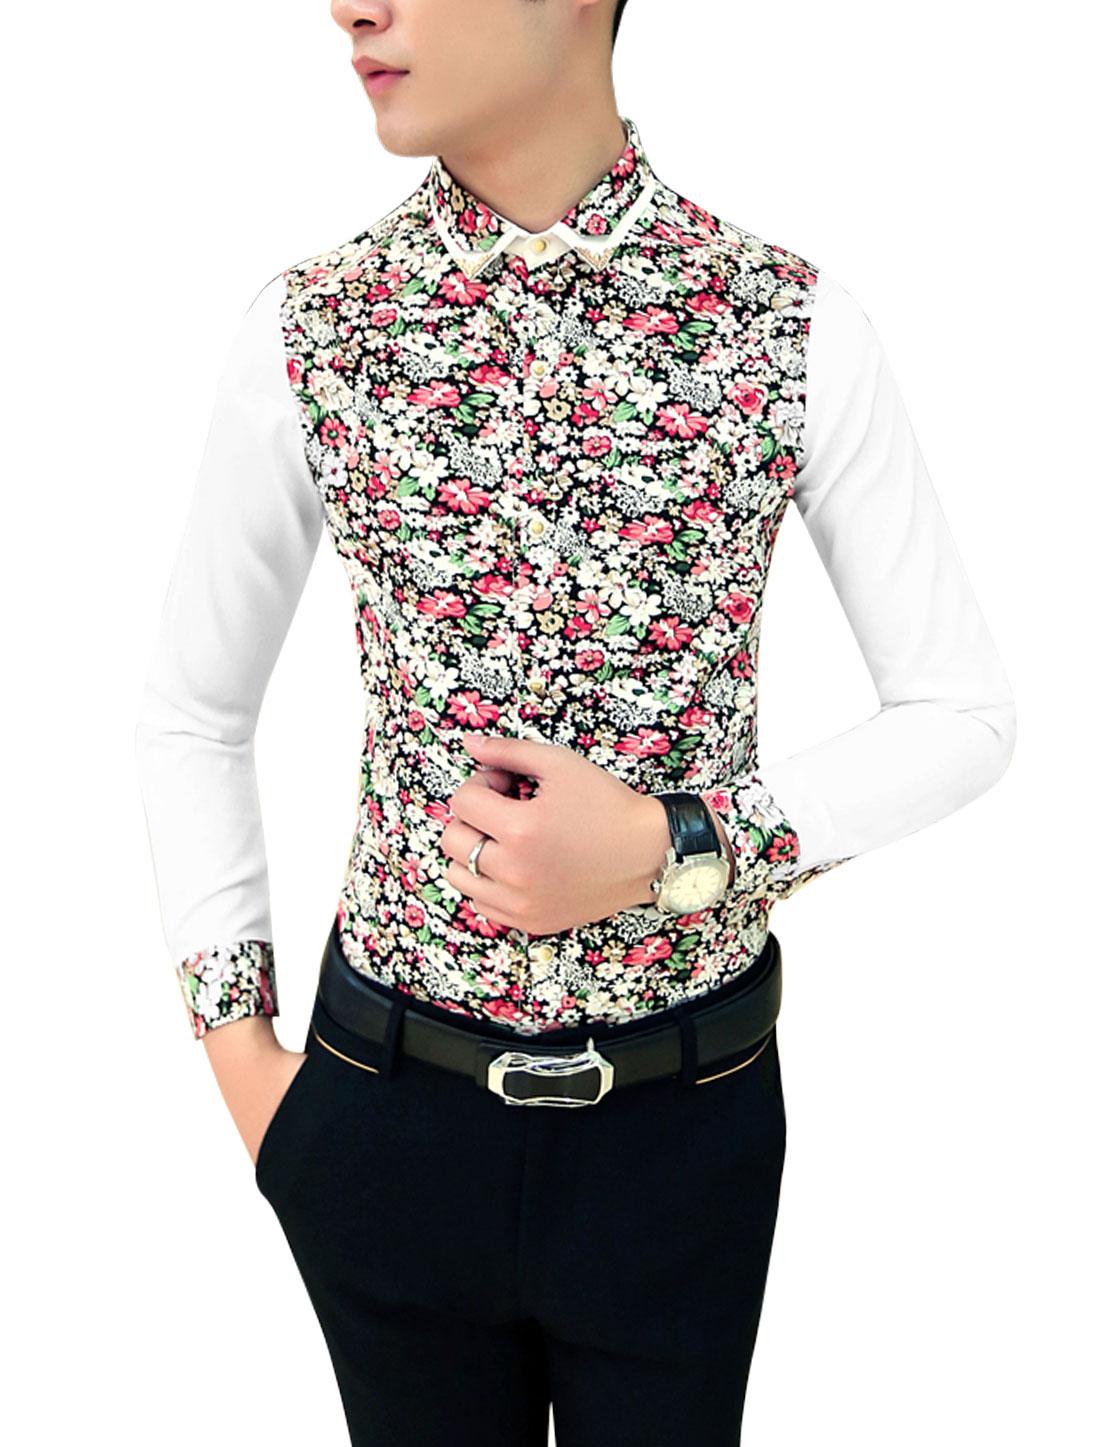 Men Contrast Buttoned Cuffs Contrast Floral Print Slim Cut Shirt Coral Beige M